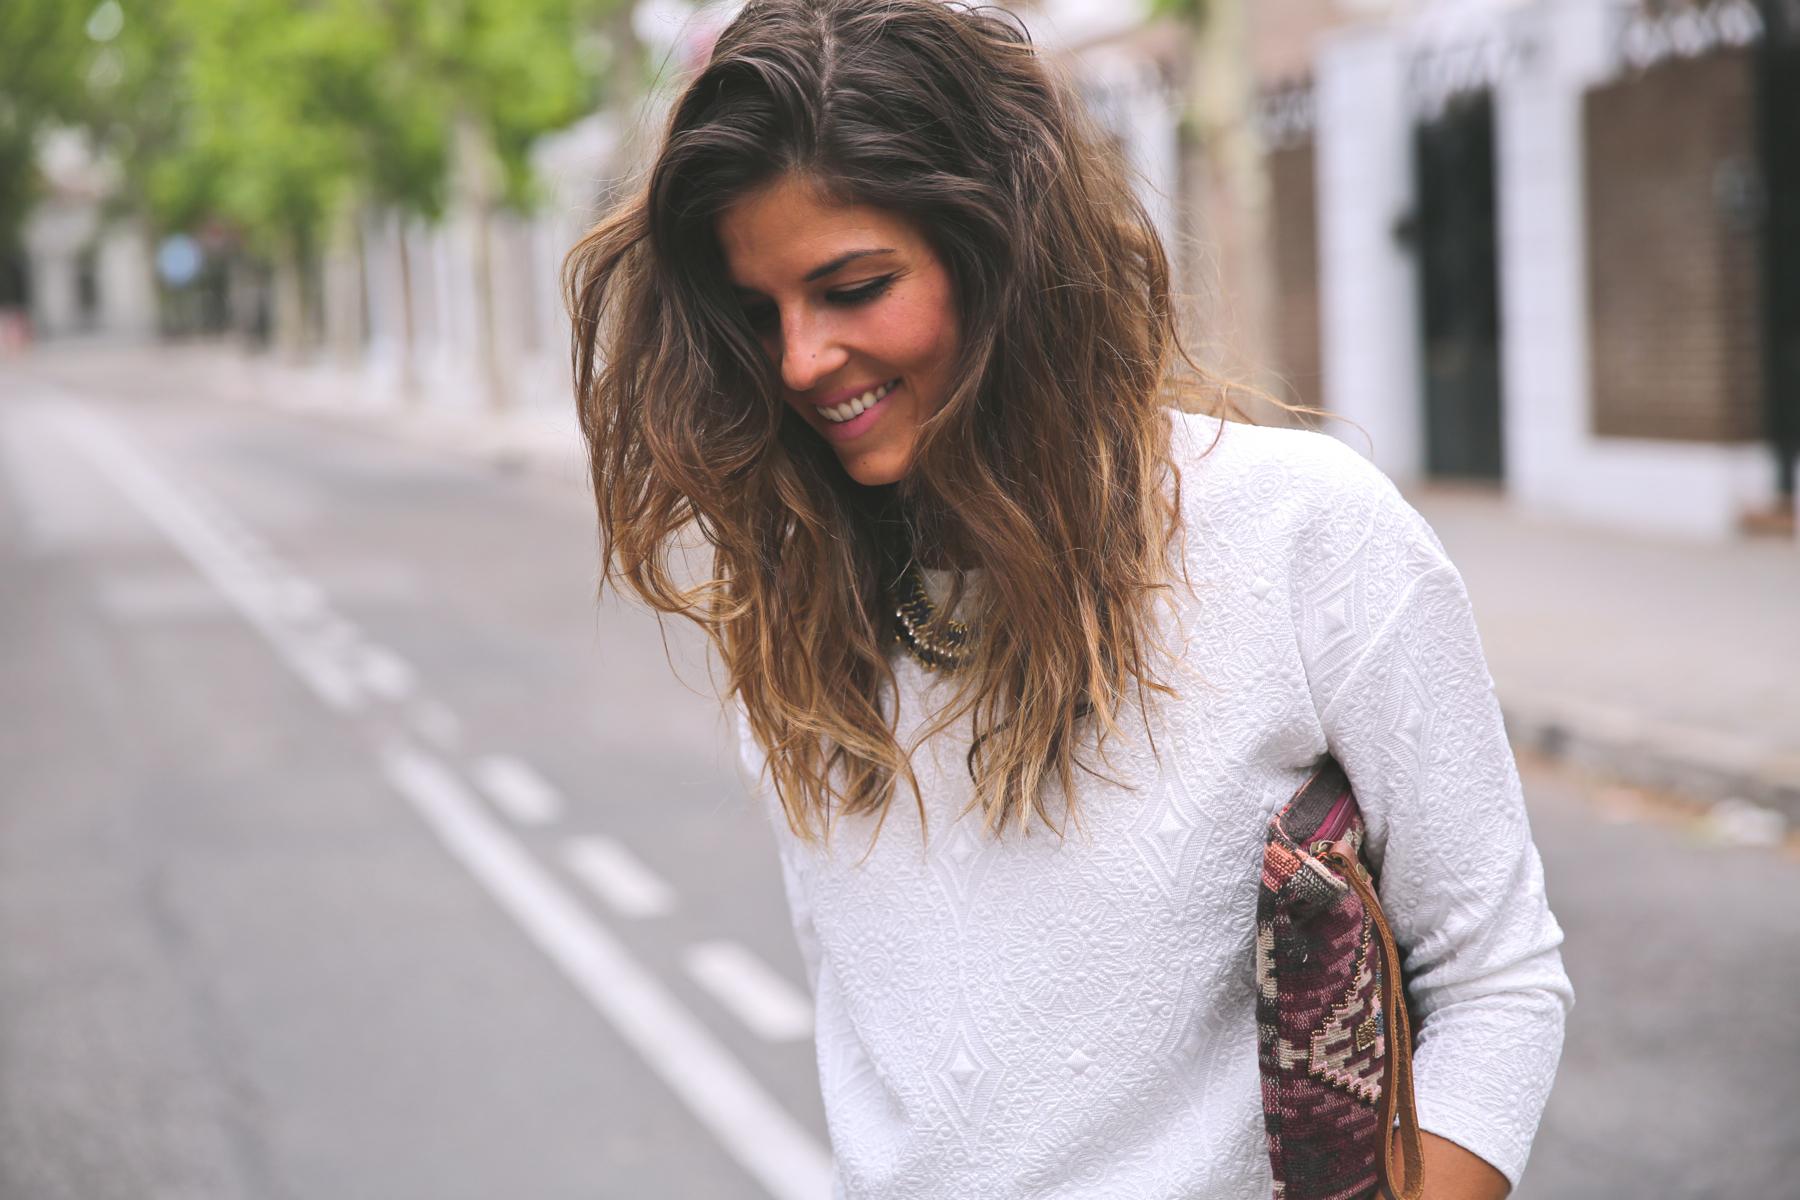 trendy_taste-look-outfit-street_style-ootd-blog-blogger-fashion_spain-moda_españa-denim_shorts-shorts_vaqueros-top_blanco-white_top-sandalias_cordones-ethnic_cluth-clutch_etnico-el_corte_ingles-4